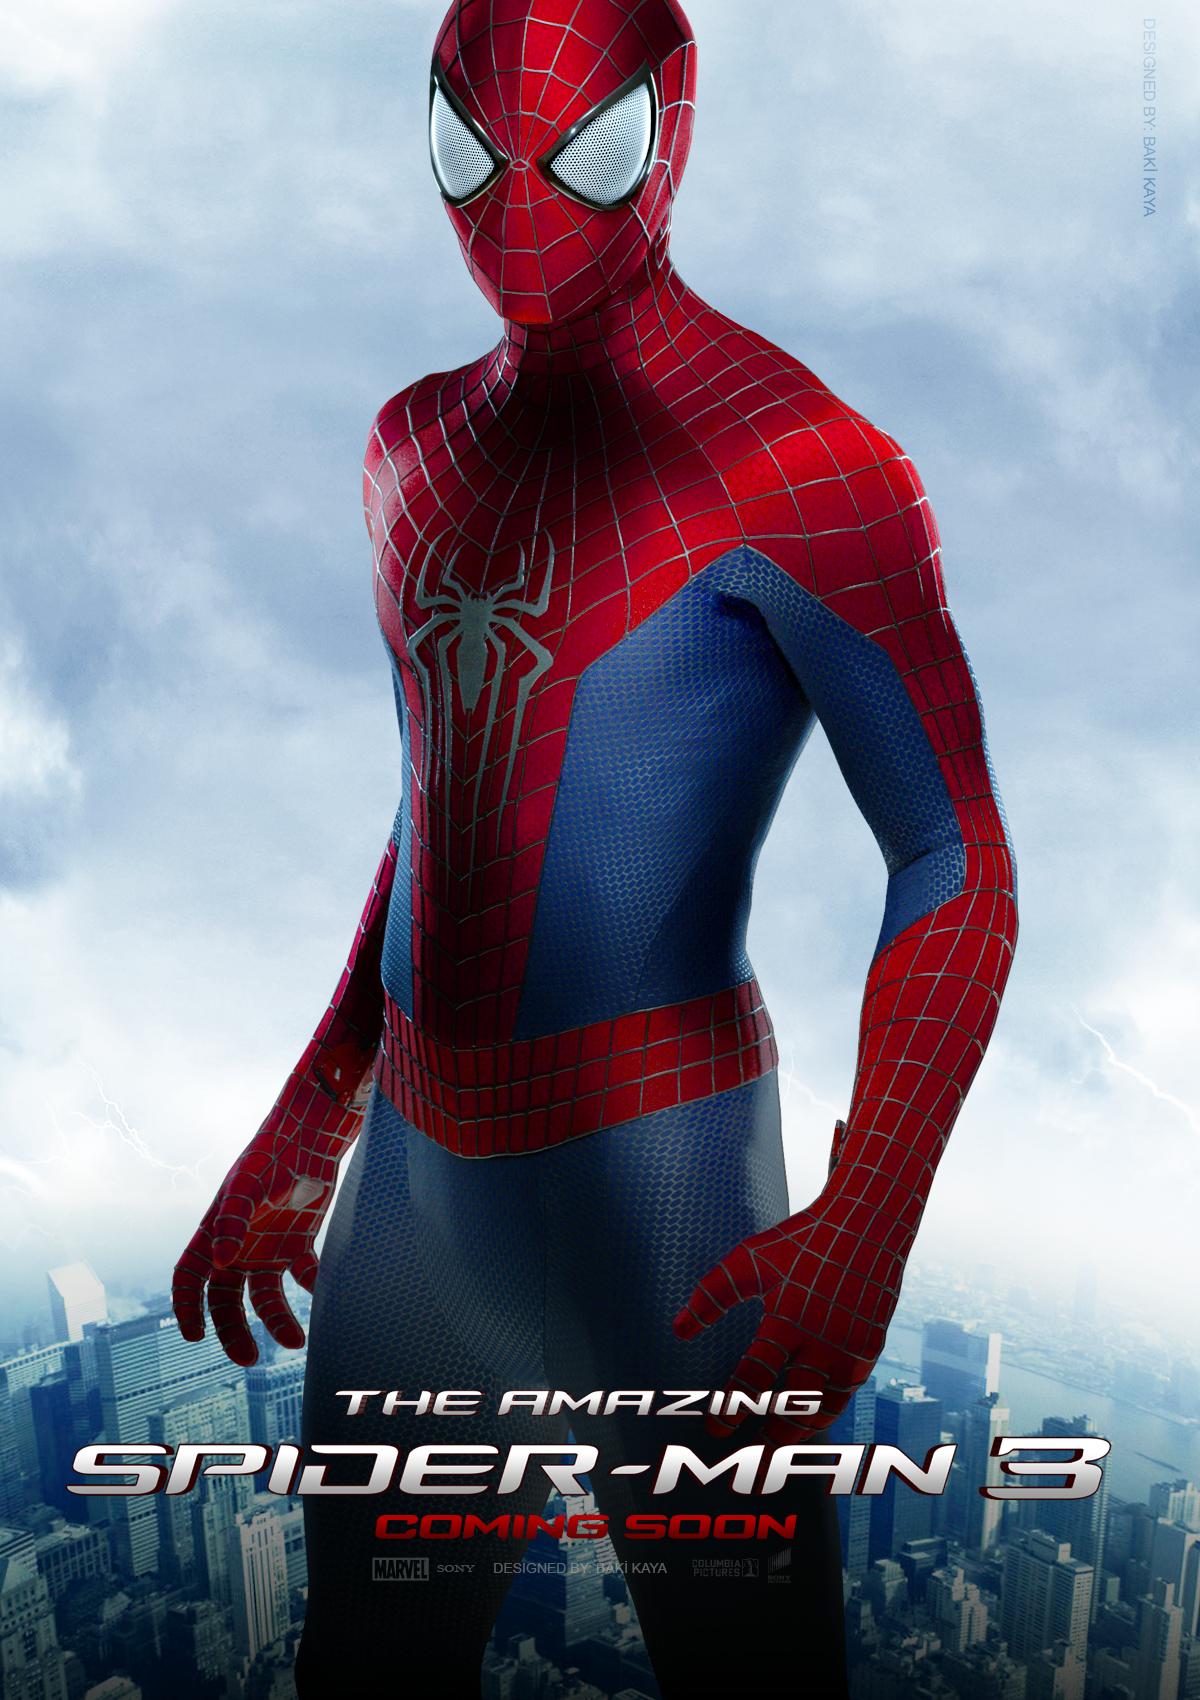 Spider Solitaire (2 Suits) - solitr.com